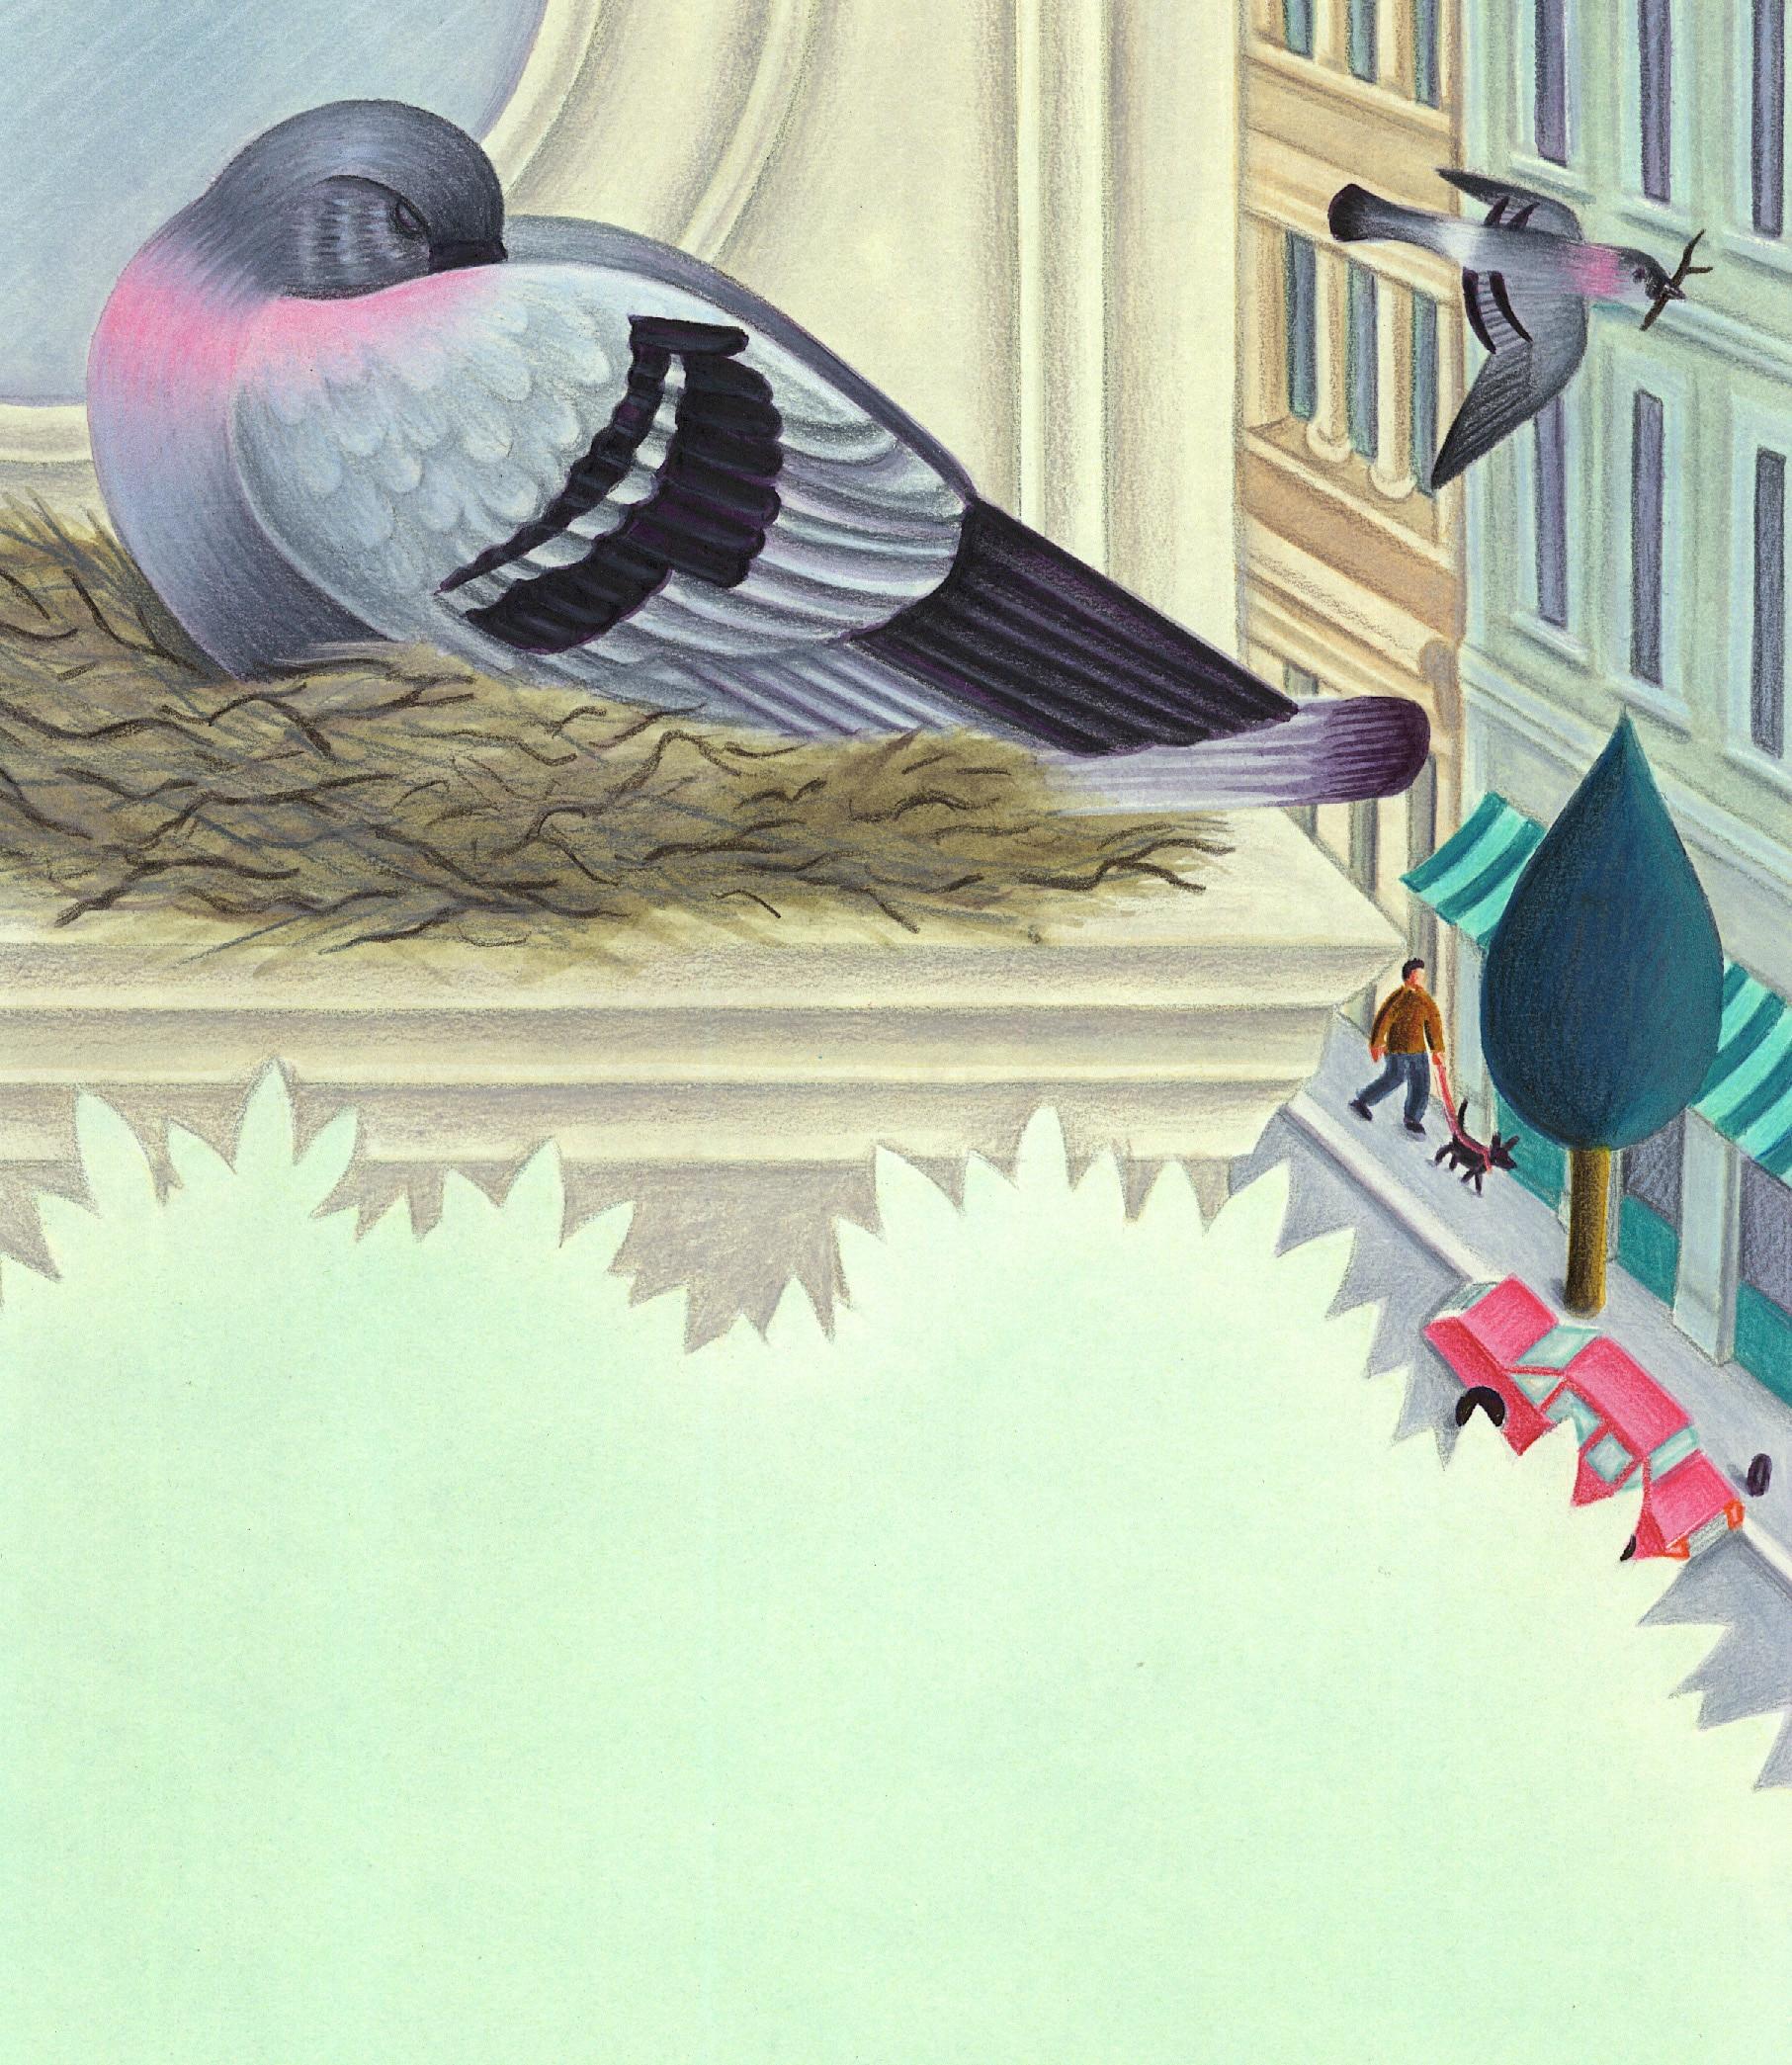 Birds Birds Birds Gallery. Illustration 6 'Birds might live by a window'